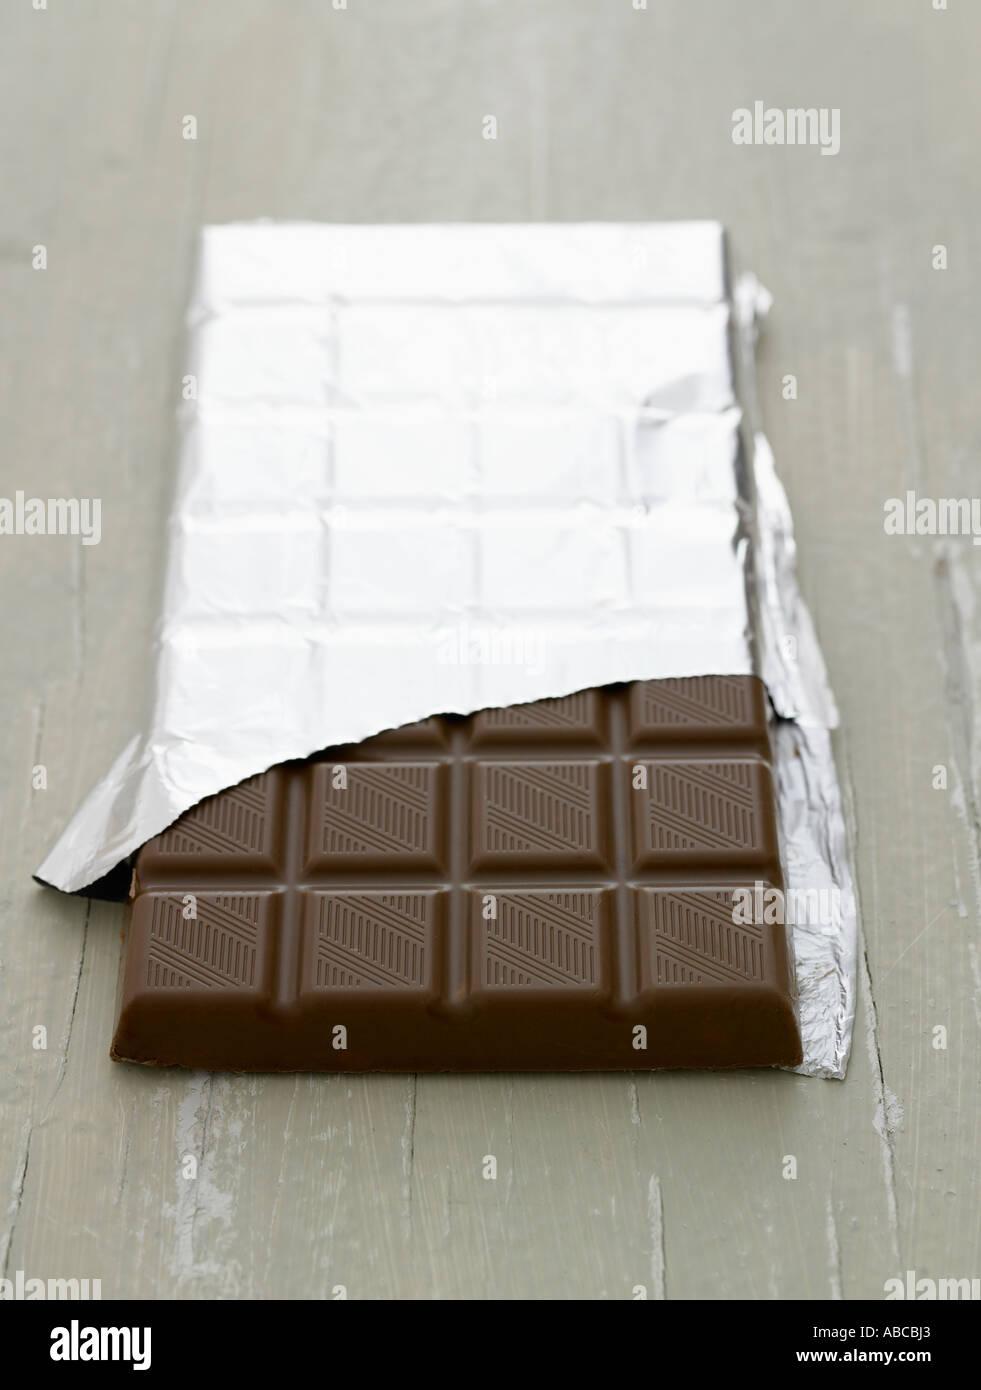 Opened Bar Of Chocolate Imágenes De Stock & Opened Bar Of Chocolate ...